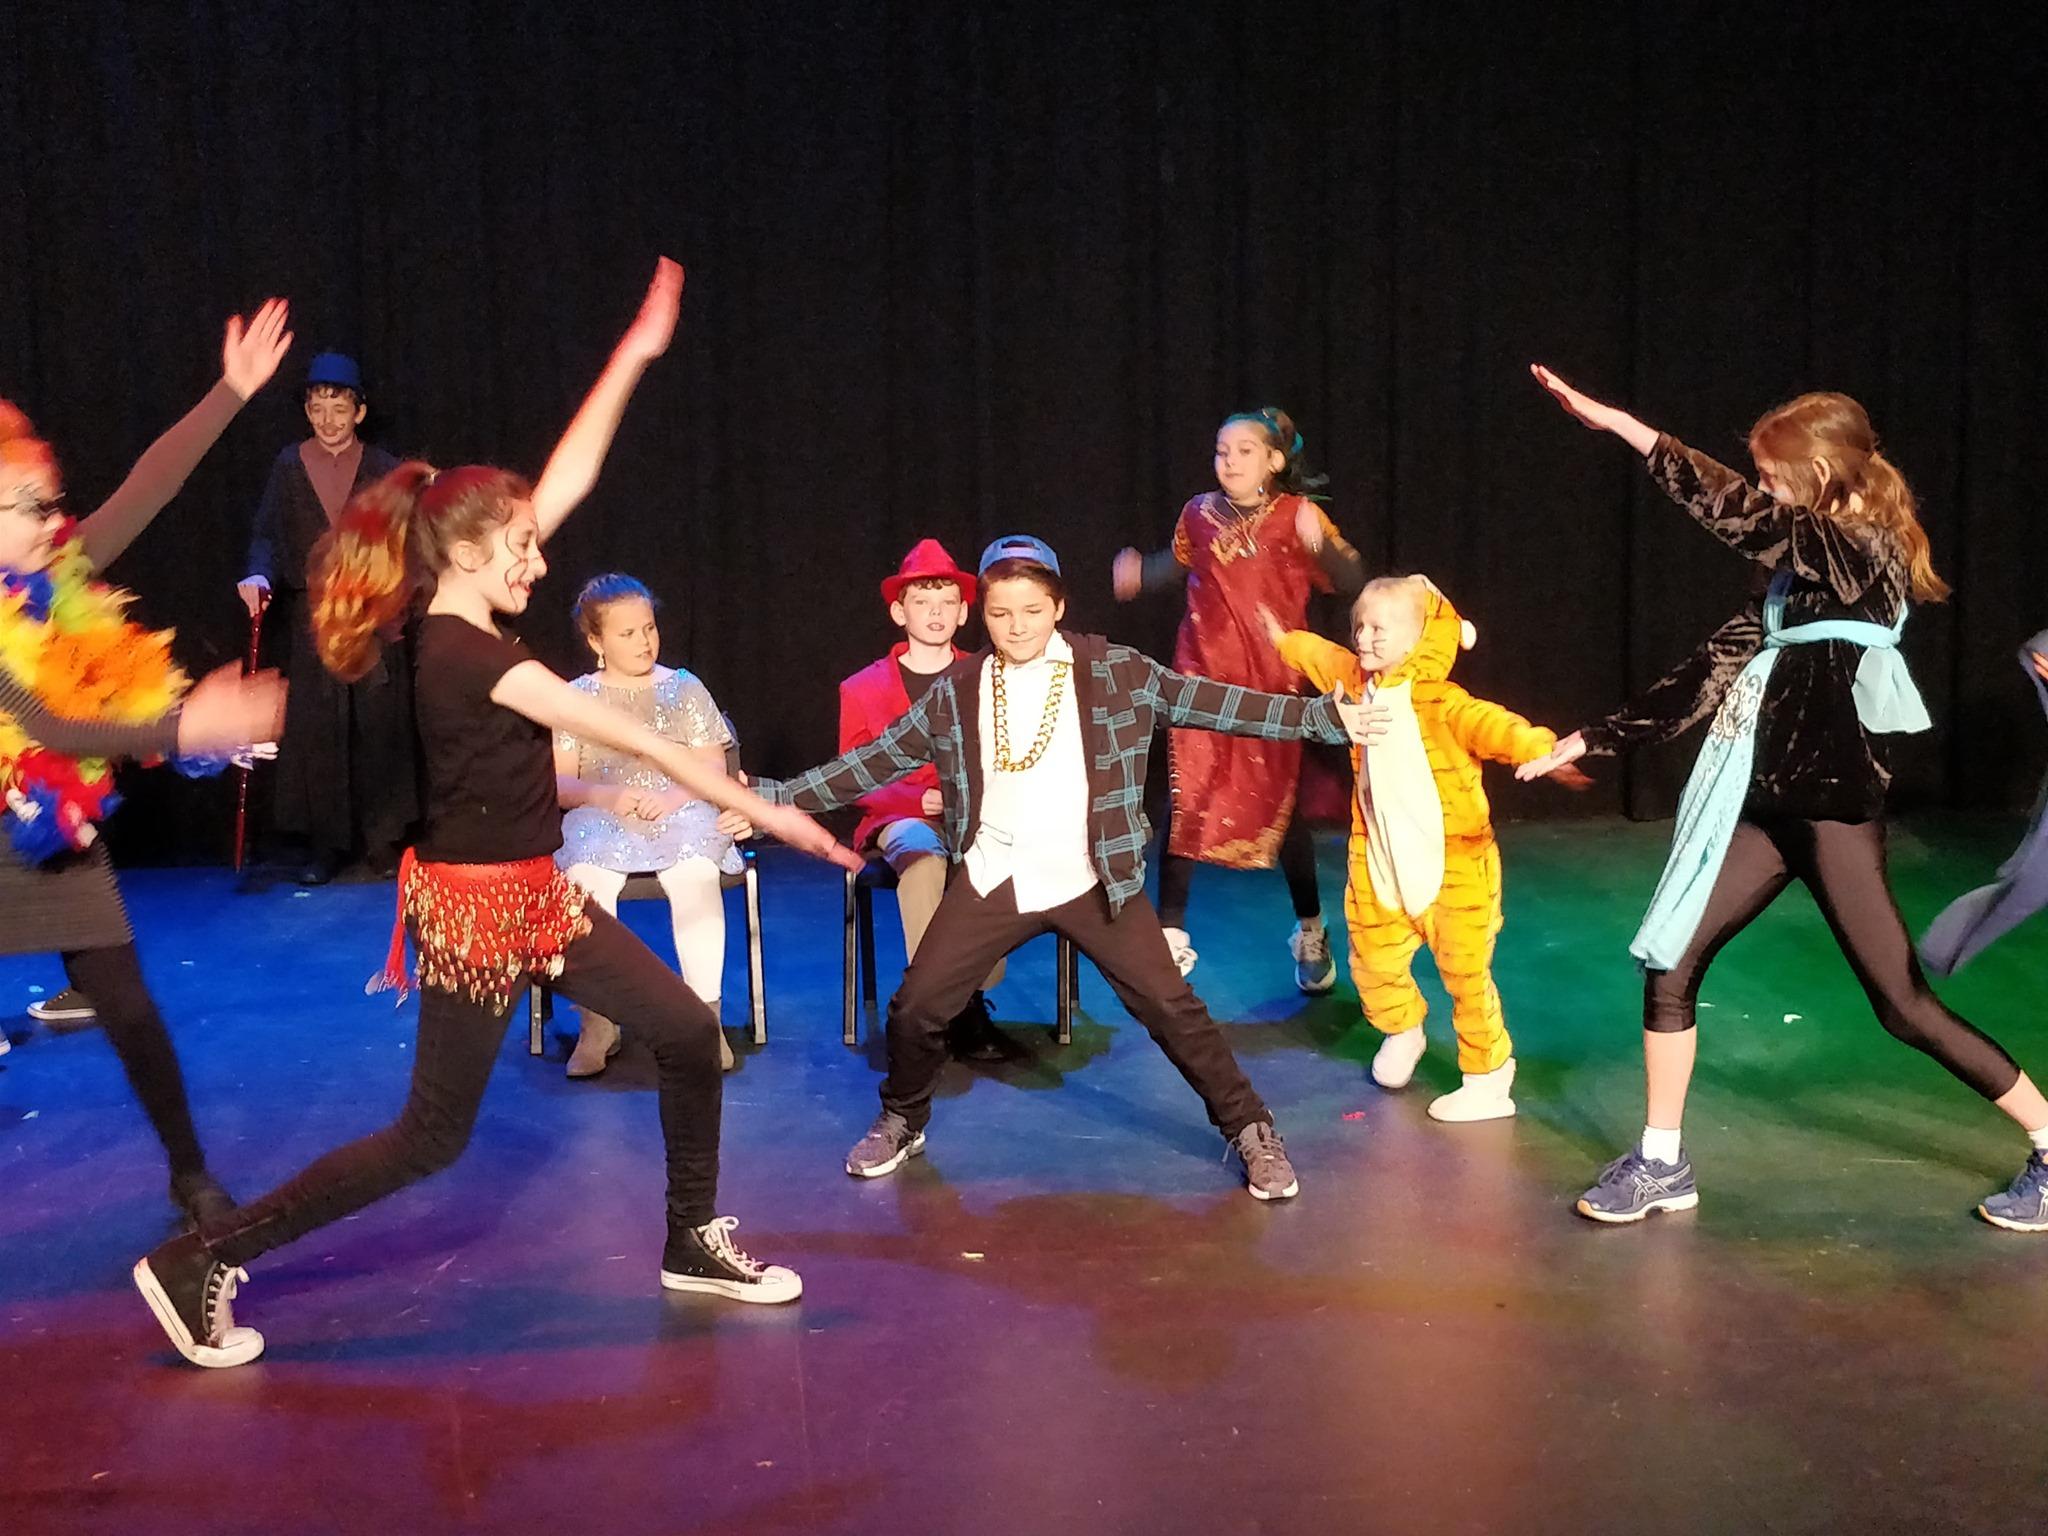 aladdin budding theatre kids drama canberra.jpg